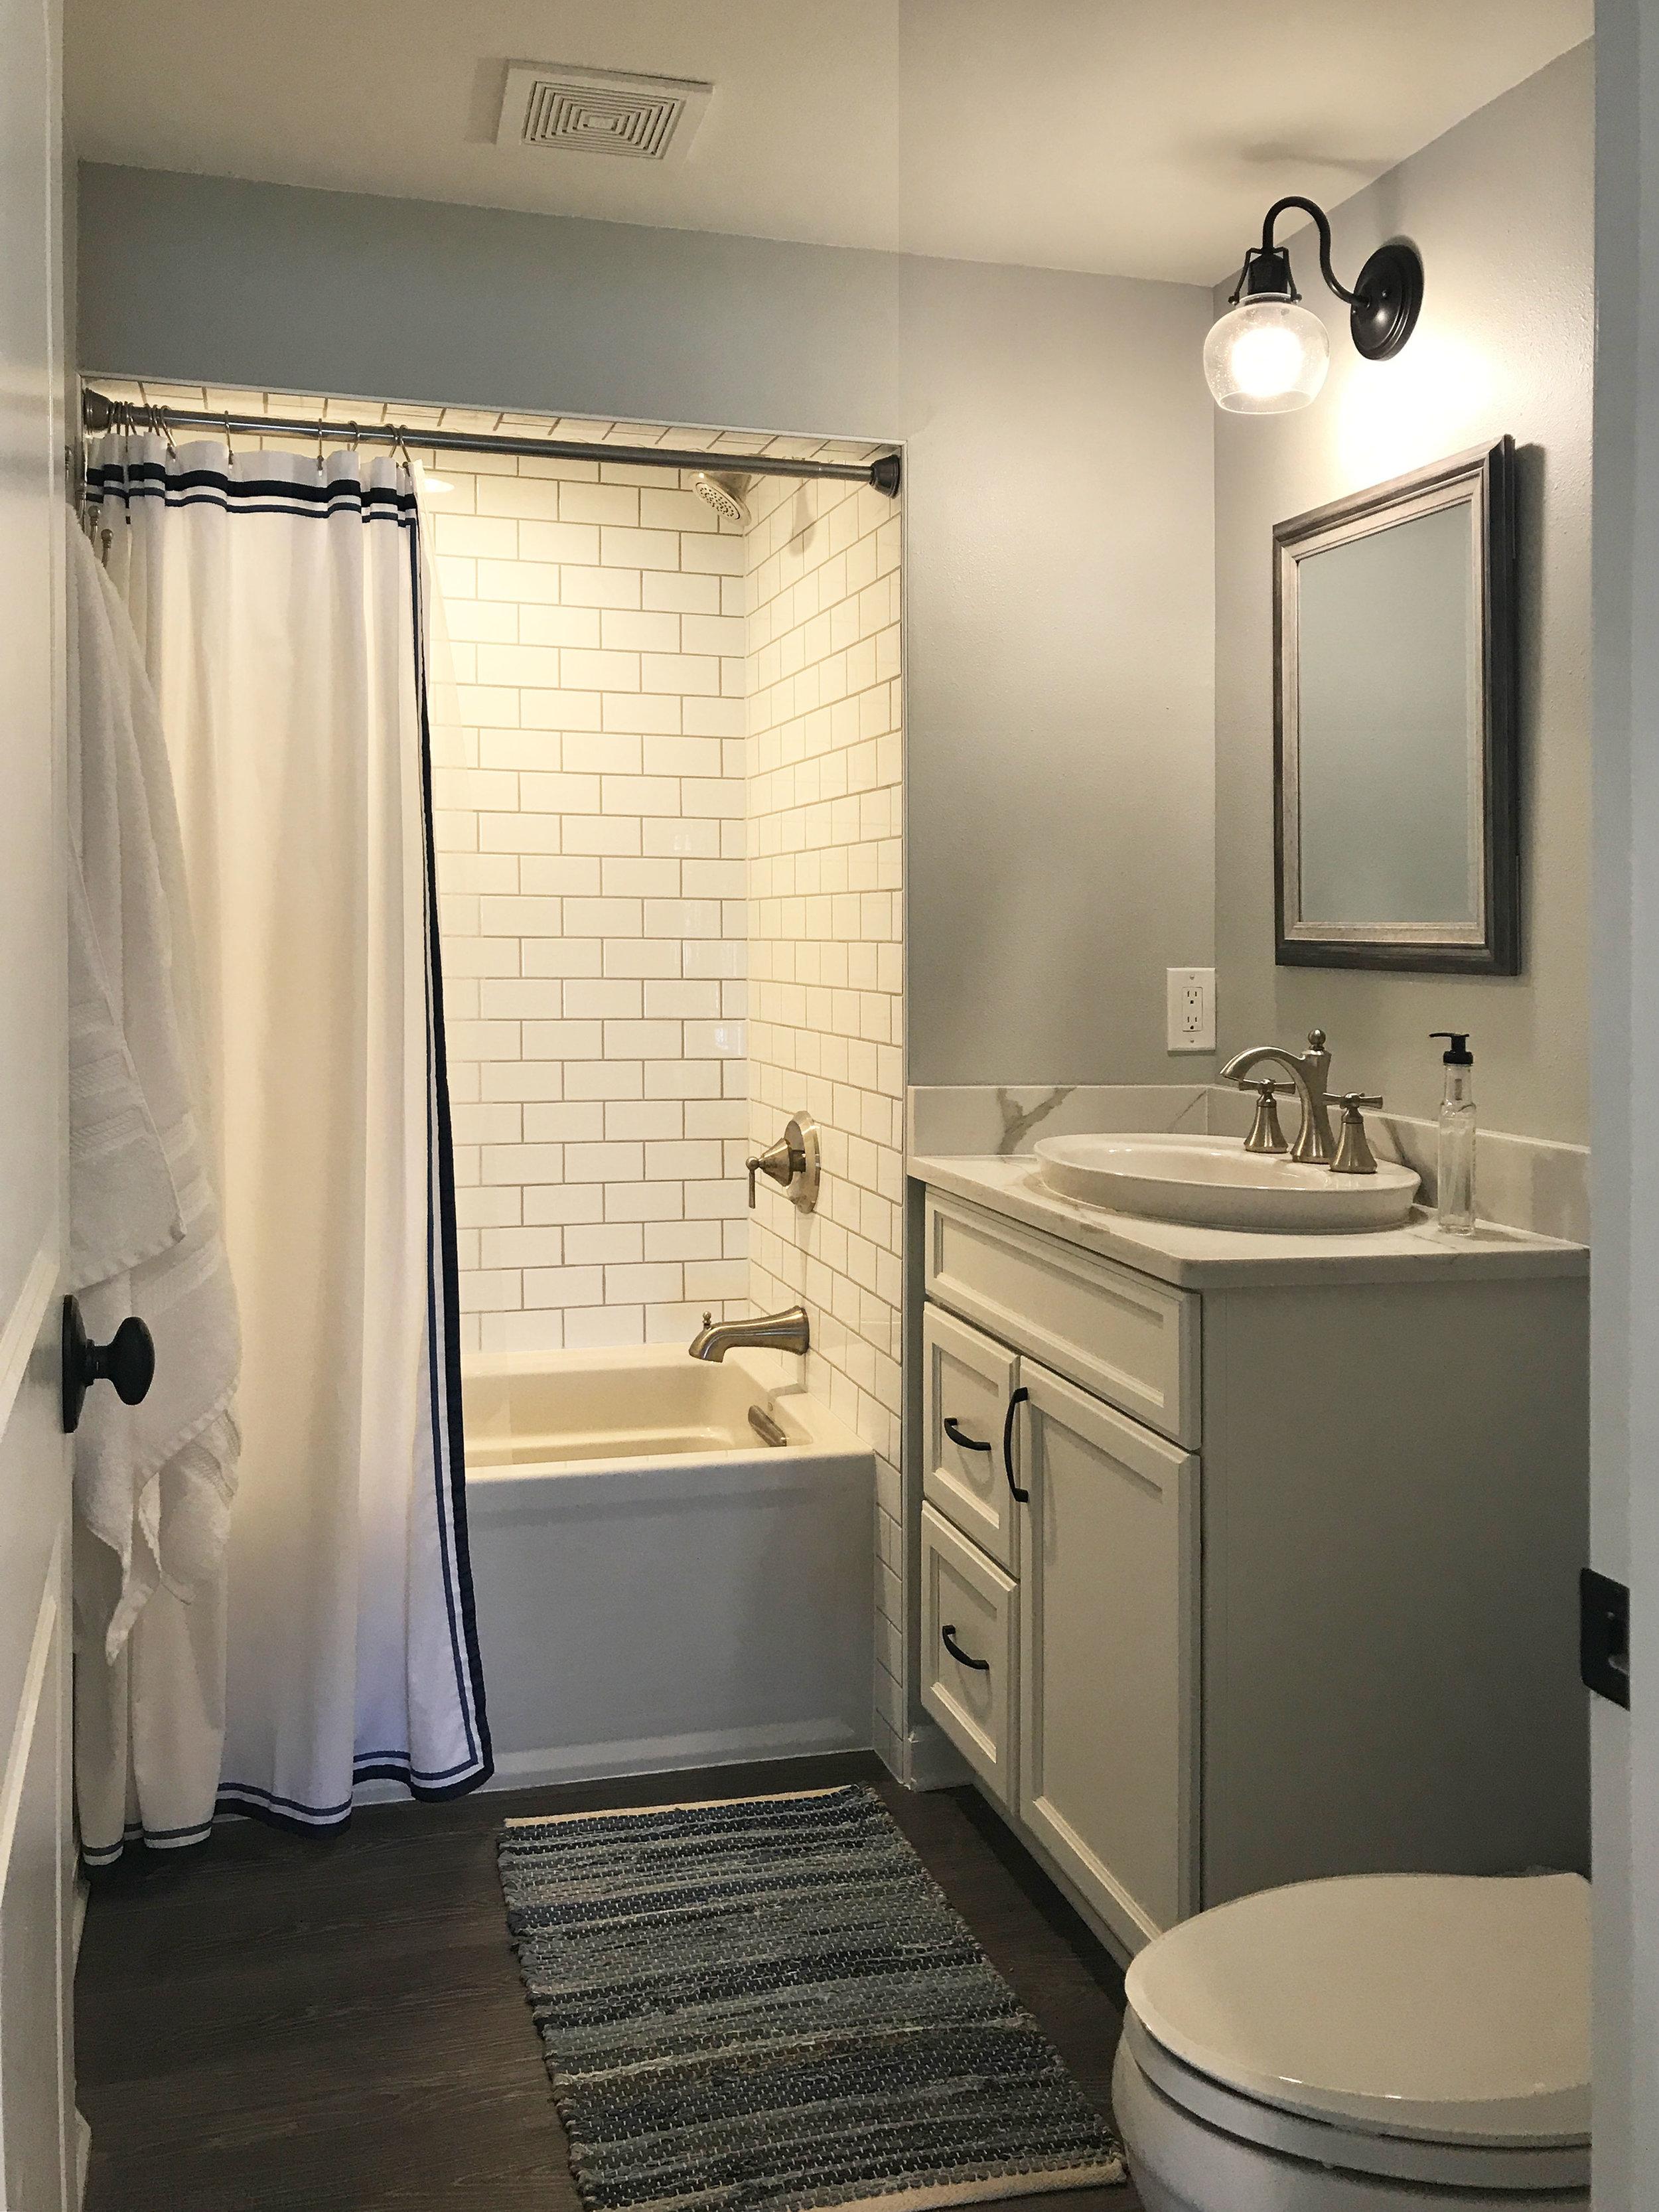 Downstiars-bath-B.jpg